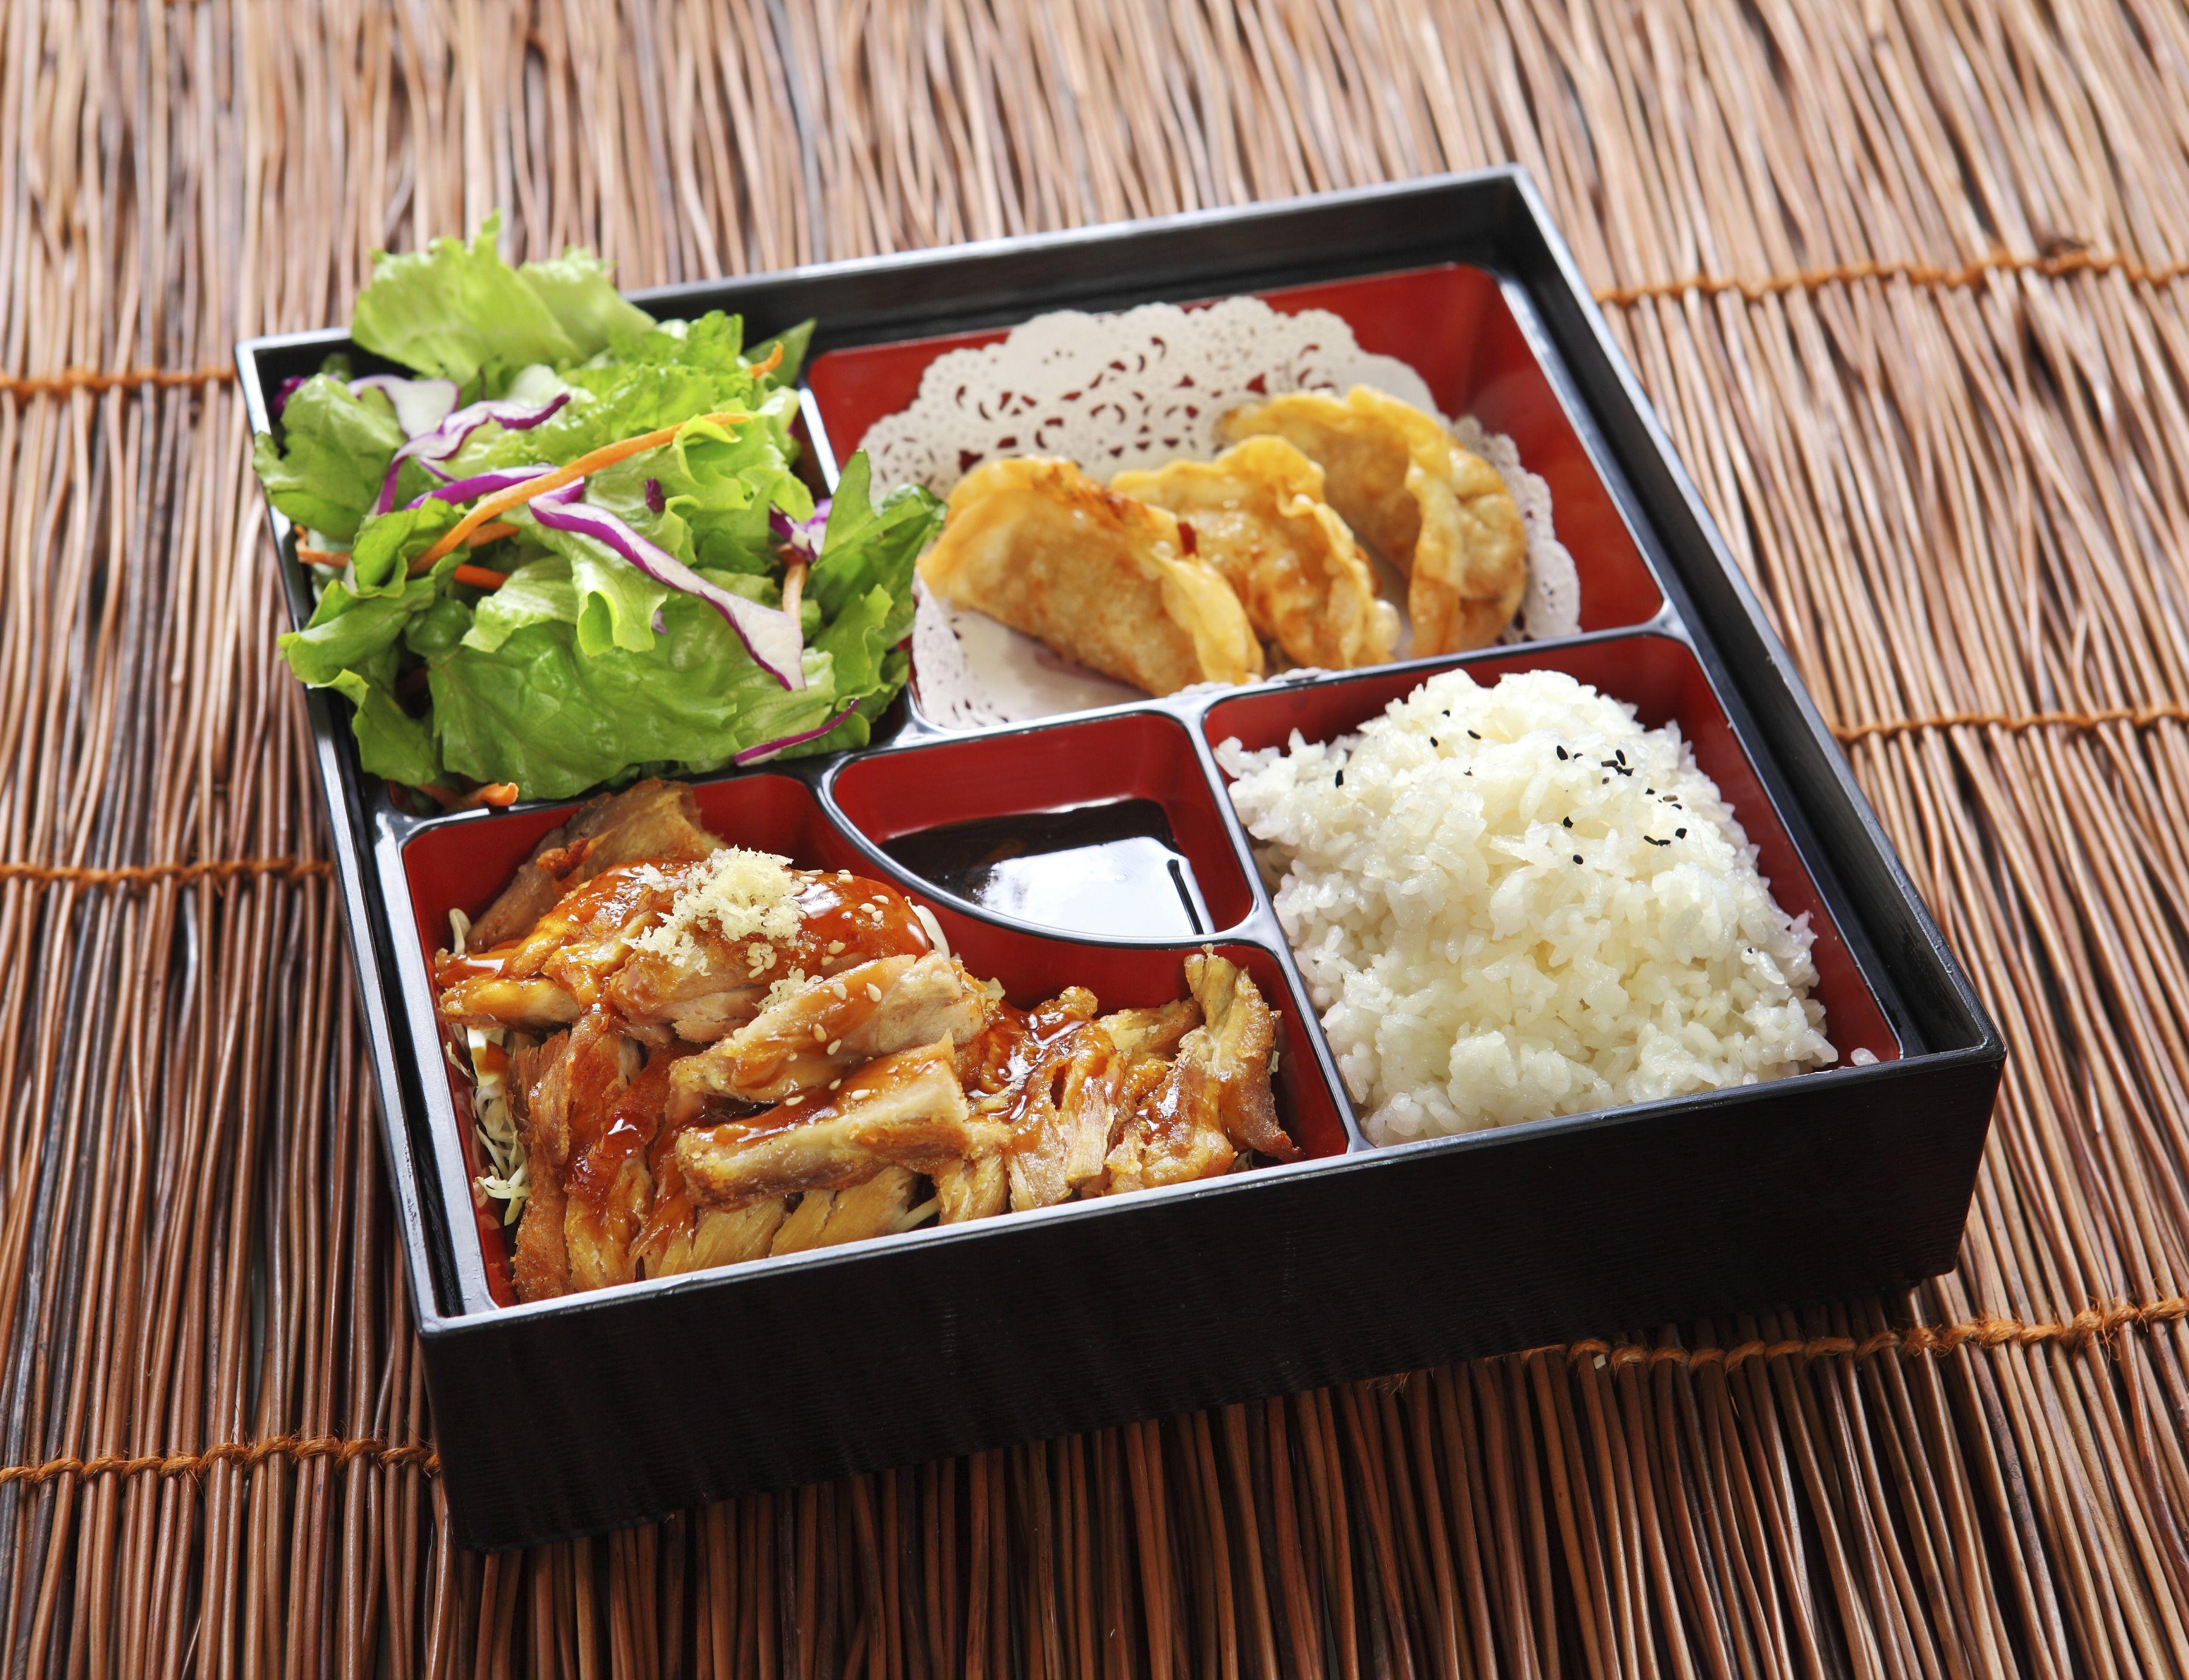 Japanese restaurant style teriyaki chicken the easiest authentic japanese teriyaki sauce recipe forumfinder Images